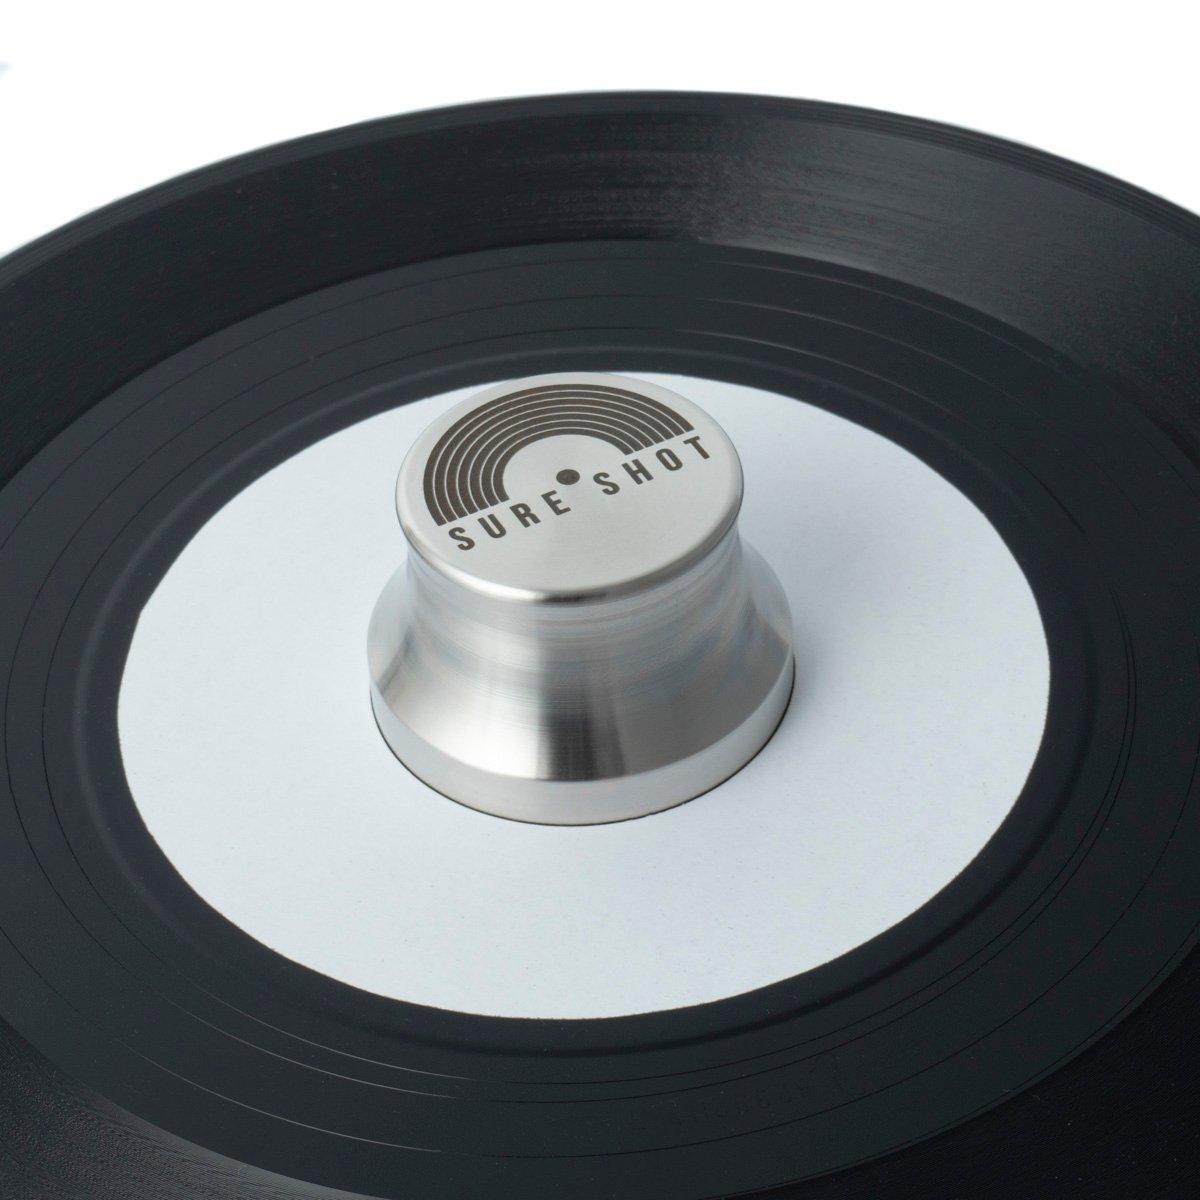 Image of Model 01 - Sure Shot 45 rpm adapter